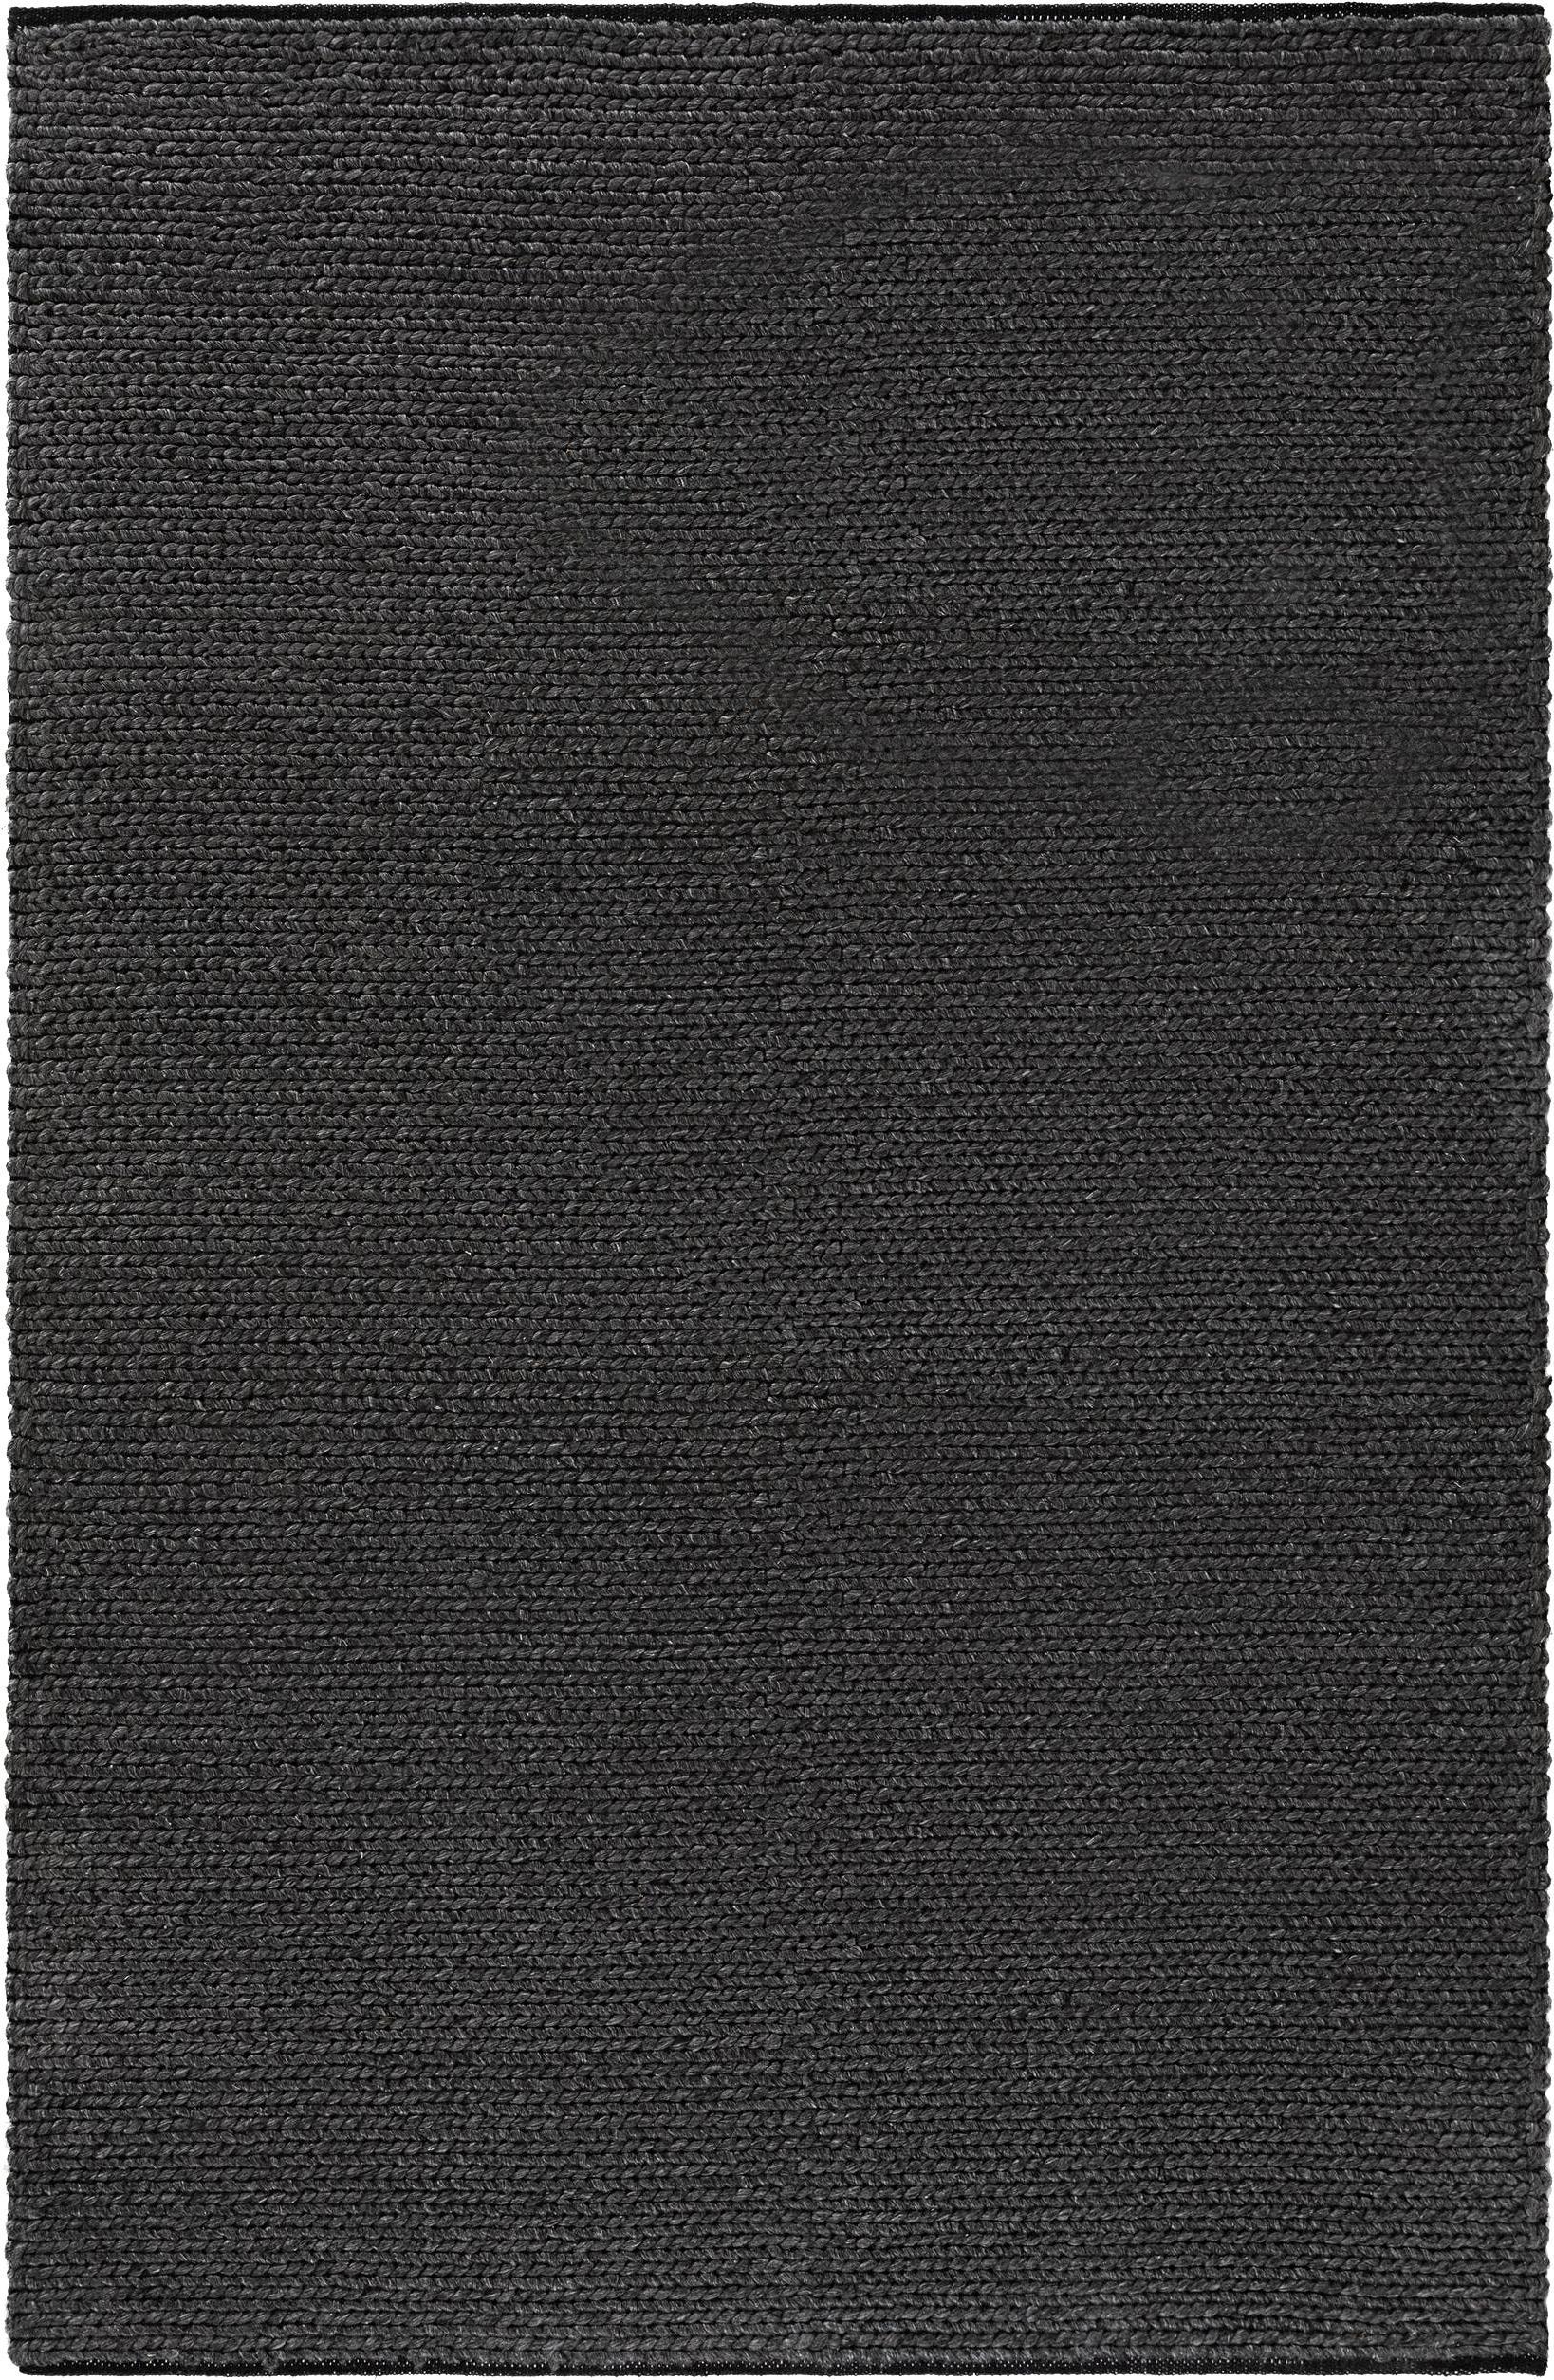 Alfombra artesanal de lana Uno, 60%lana, 40%poliéster, Gris oscuro jaspeado, An 120 x L 170 cm (Tamaño S)